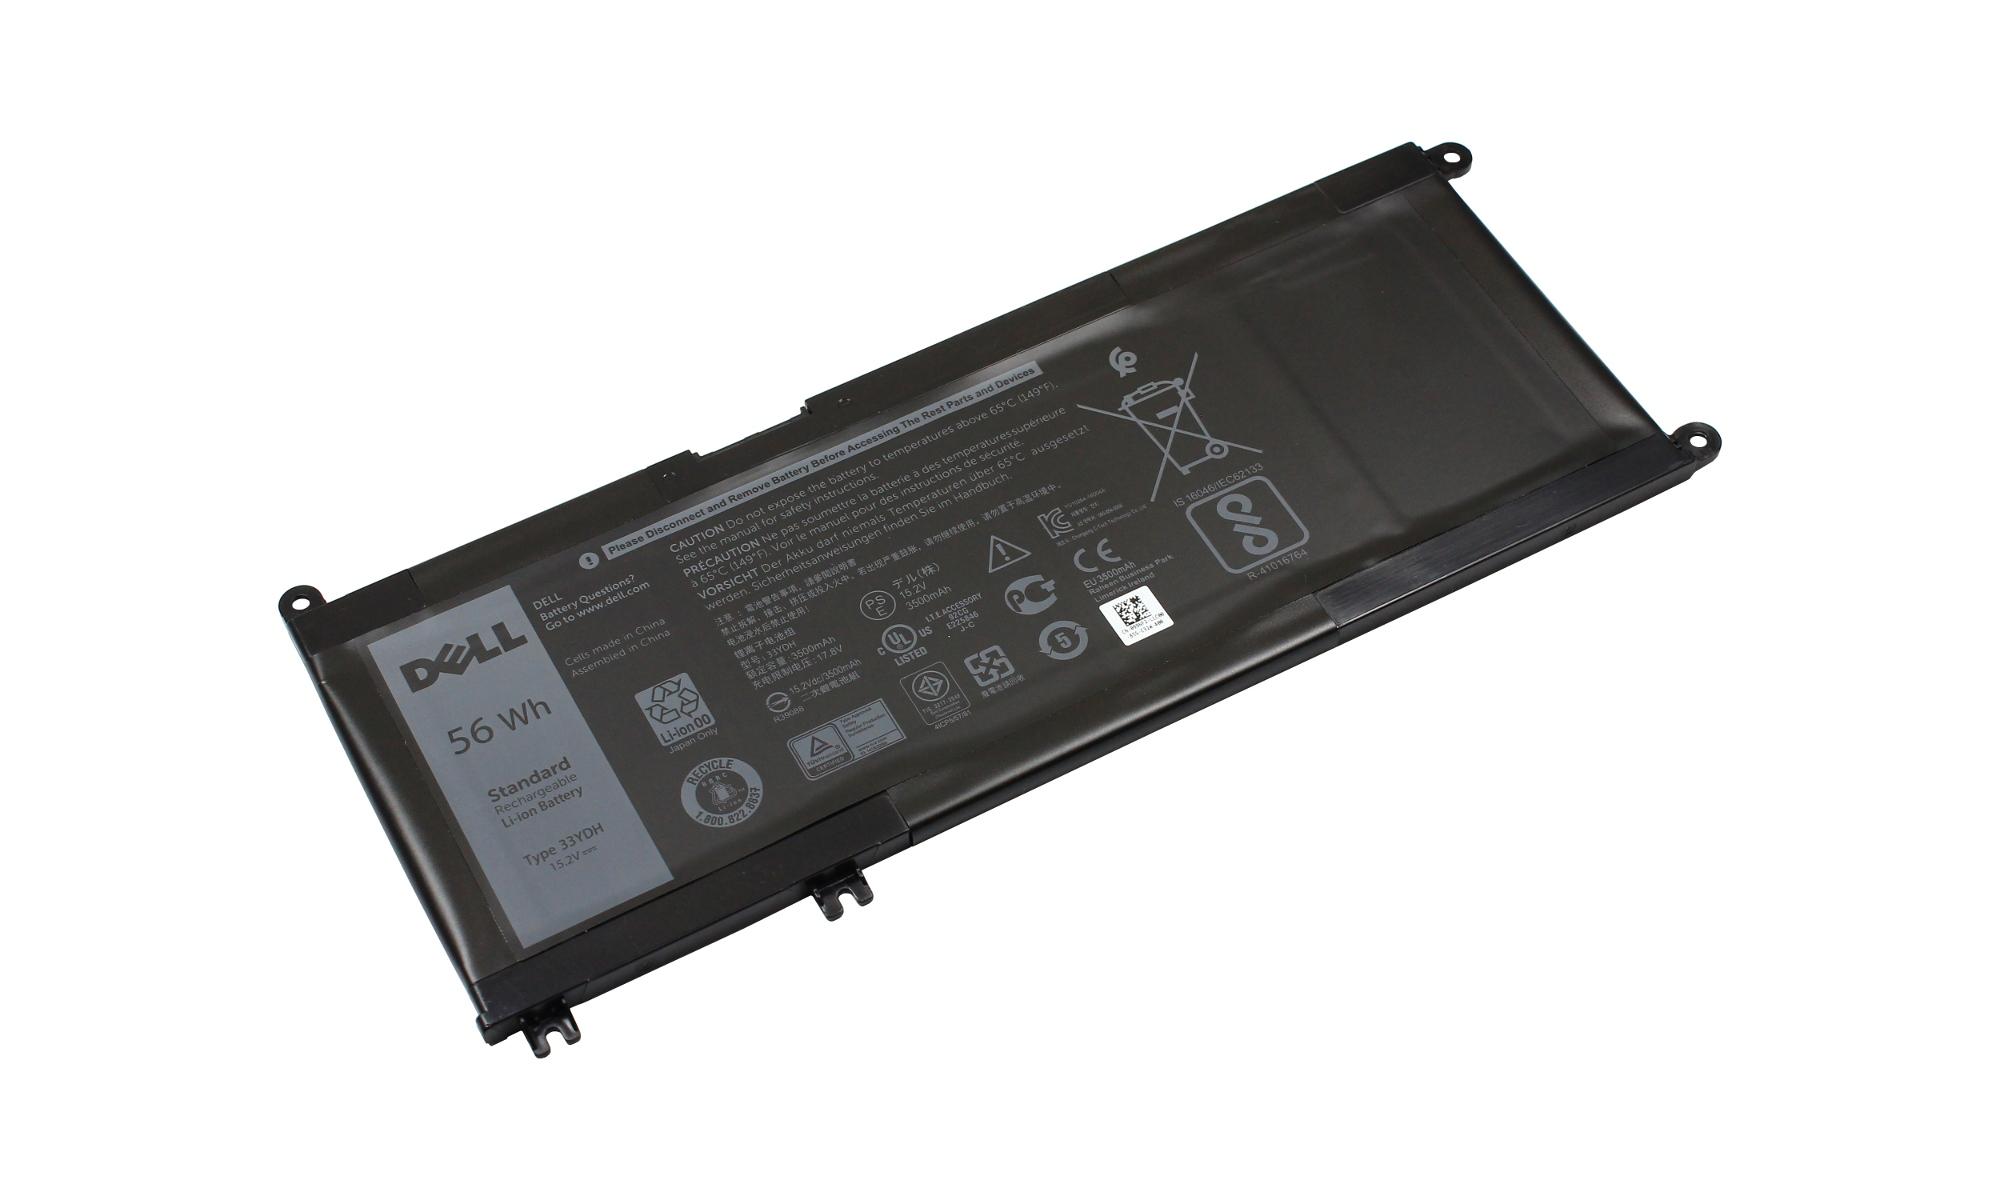 Baterie originala Dell Inspiron G5 15 5587, 56Wh 4 celule